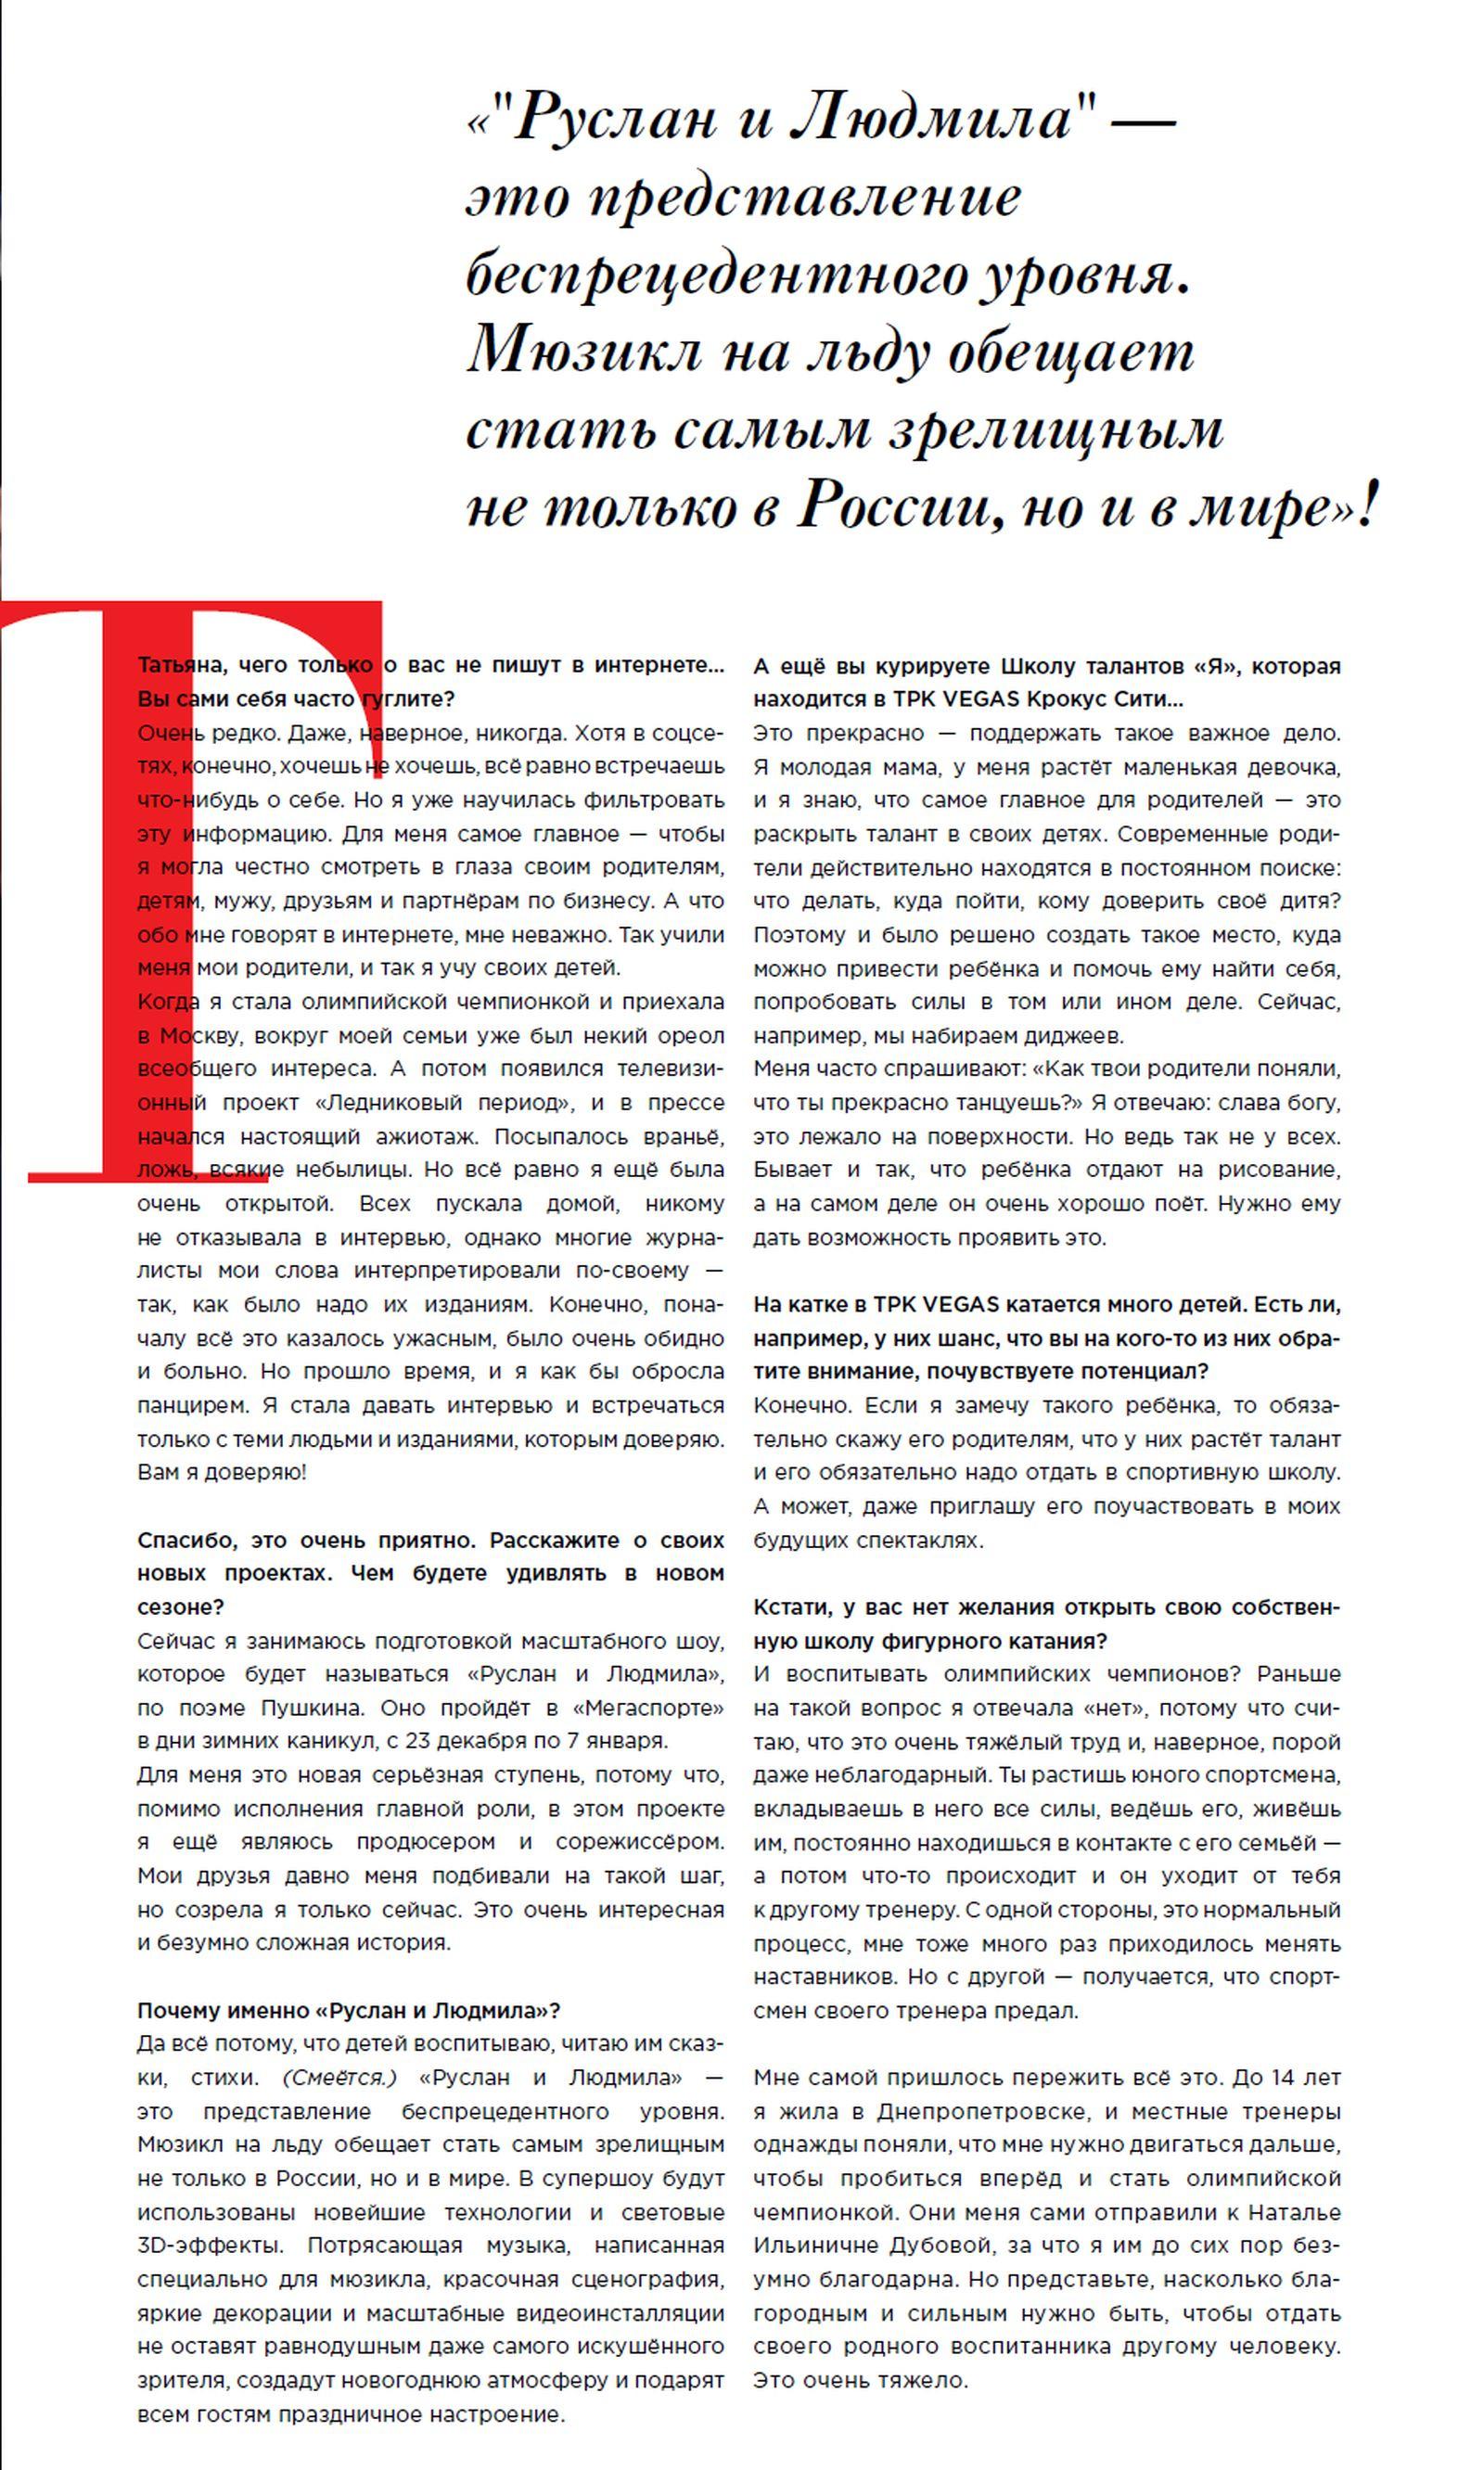 Татьяна Навка. Пресса - Страница 16 4c4ee284e6d3